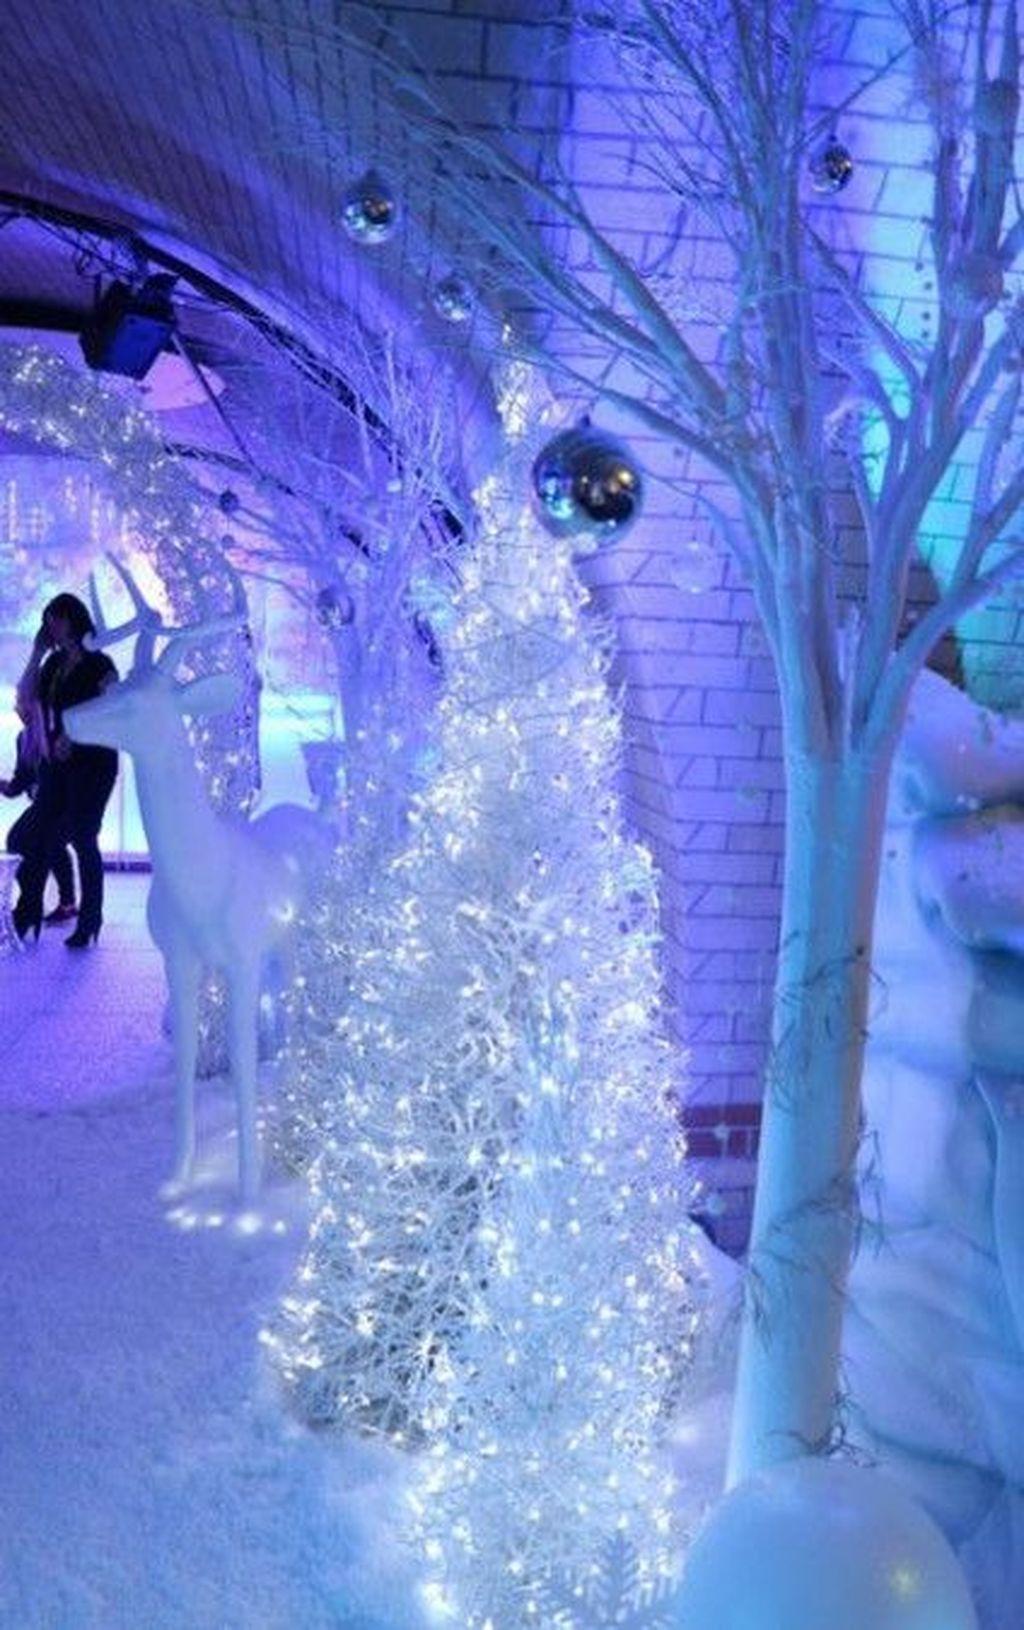 42 Beautiful Winter Wonderland Lighting Ideas For Outdoor And Indoor Decor Homyhomee Winter Wonderland Christmas Party Winter Wonderland Christmas Winter Wonderland Decorations